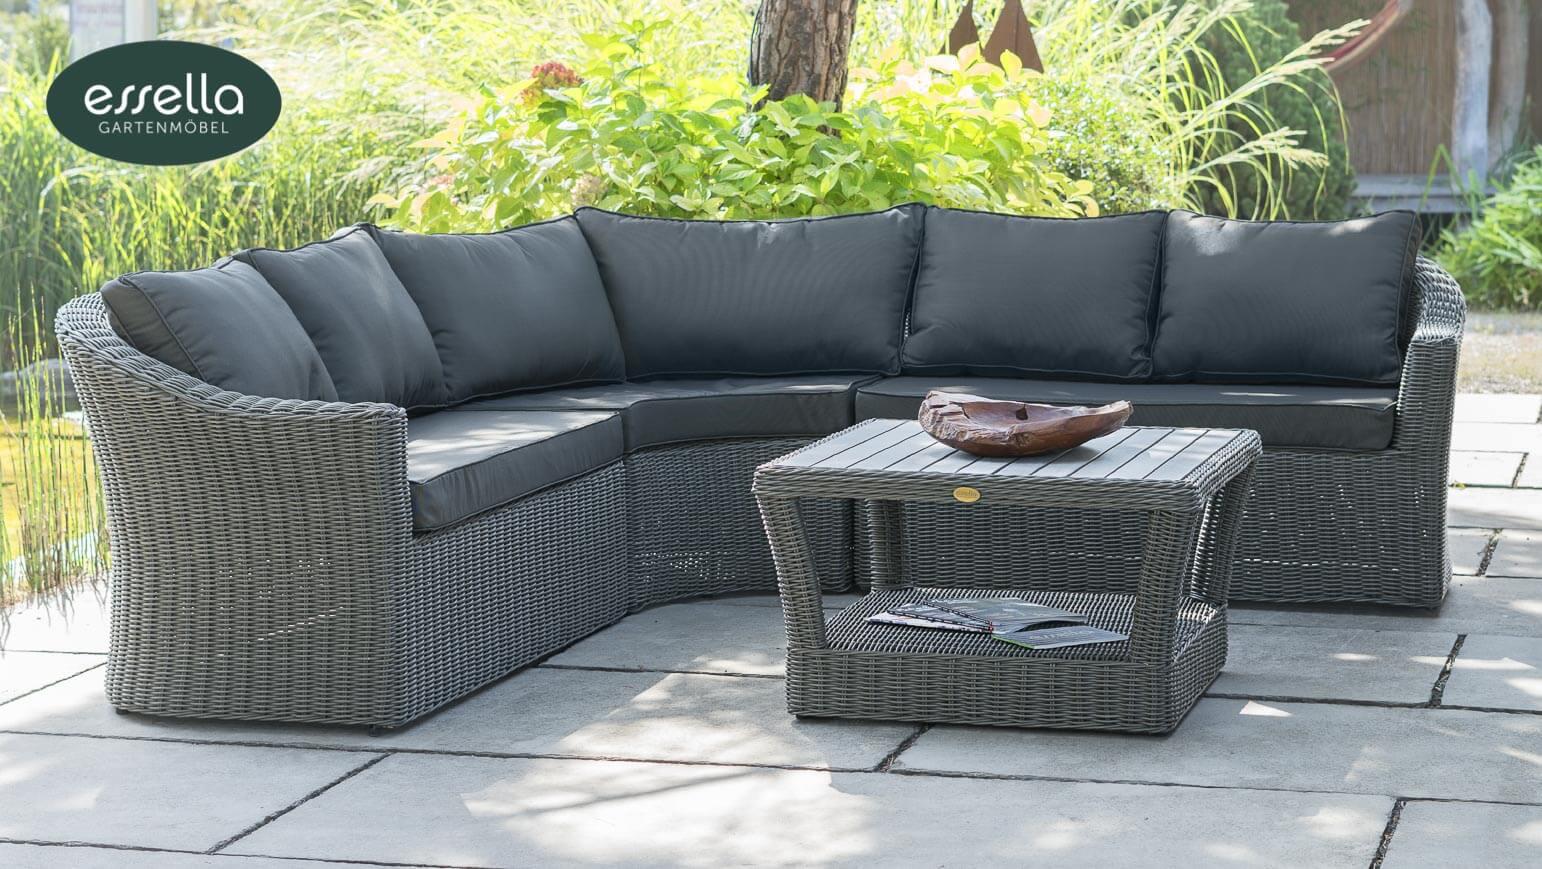 essella polyrattan lounge porto 5 personen rundgeflecht. Black Bedroom Furniture Sets. Home Design Ideas